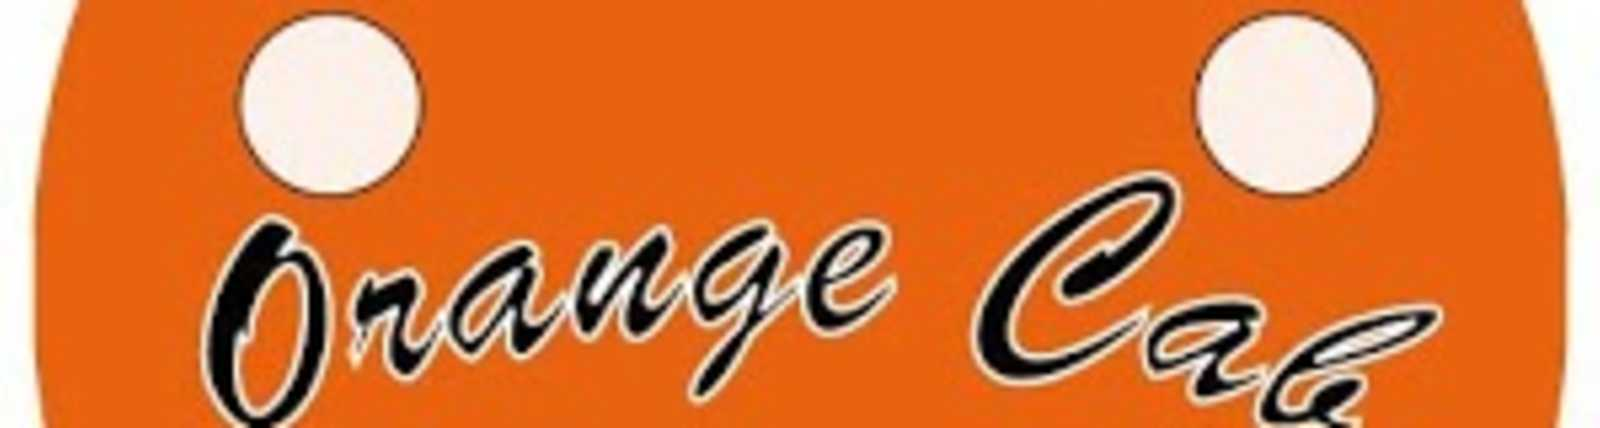 Orange_Cab_Company-3.jpg